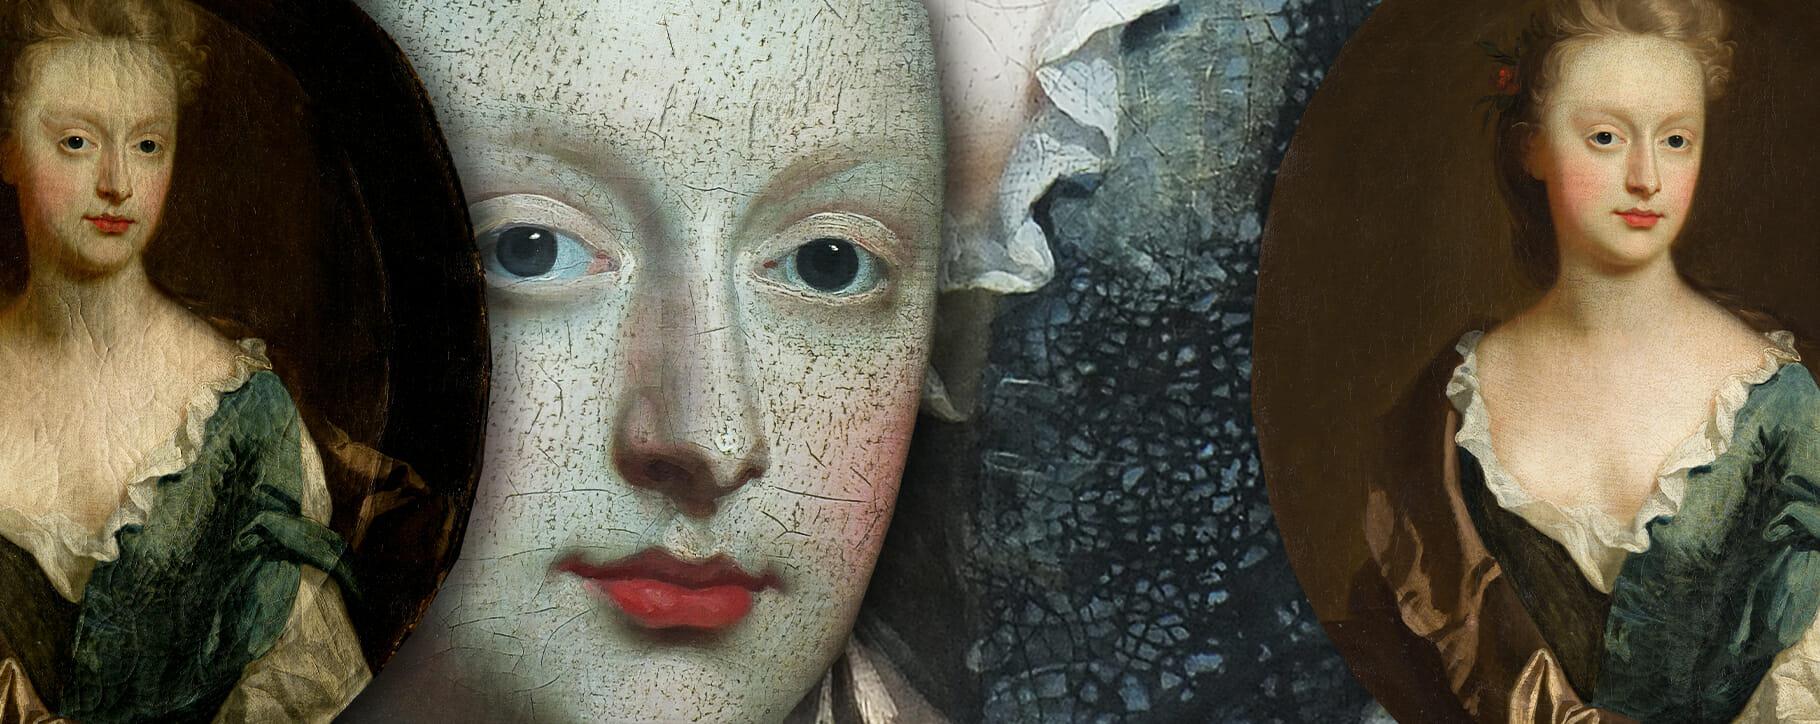 18th century Cracked Portrait